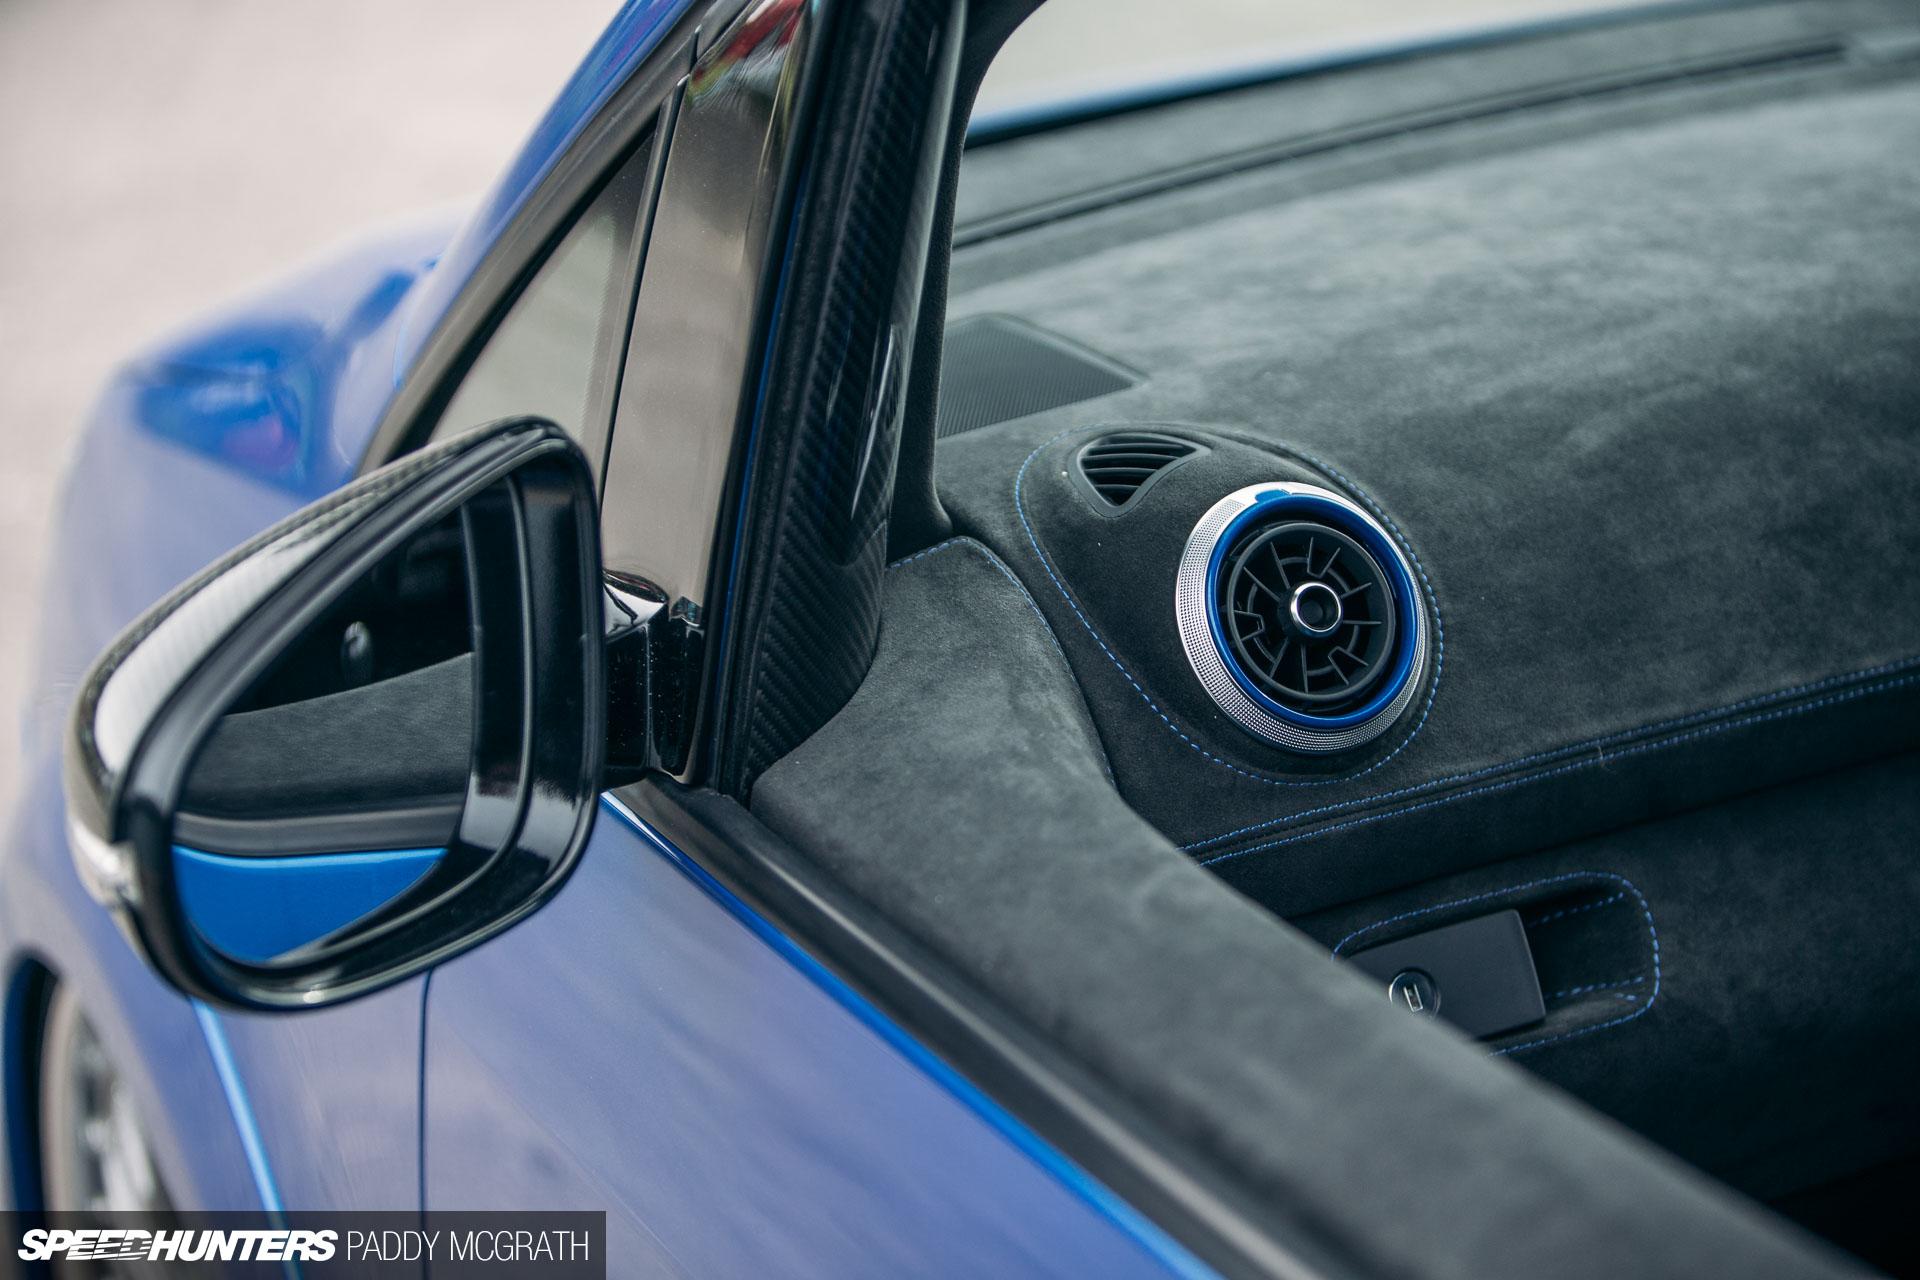 VW Caddy 2 liter TFSI